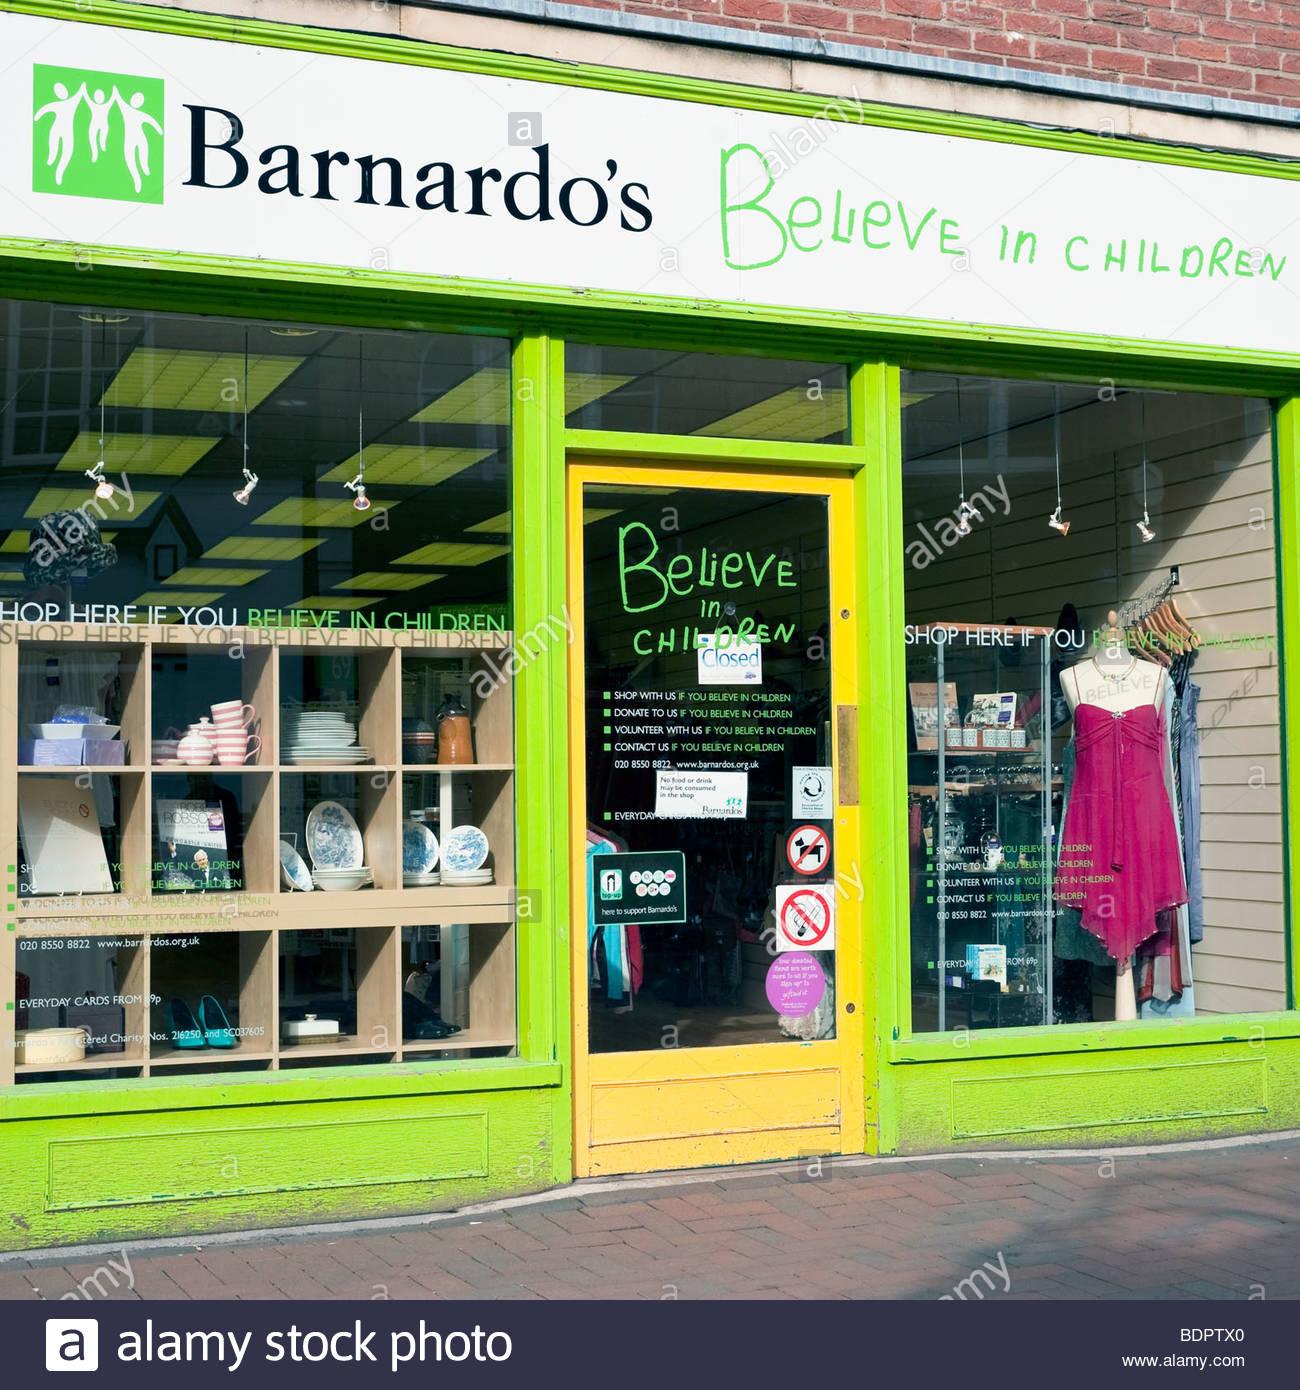 Barnardo's charity shop. - Stock Image